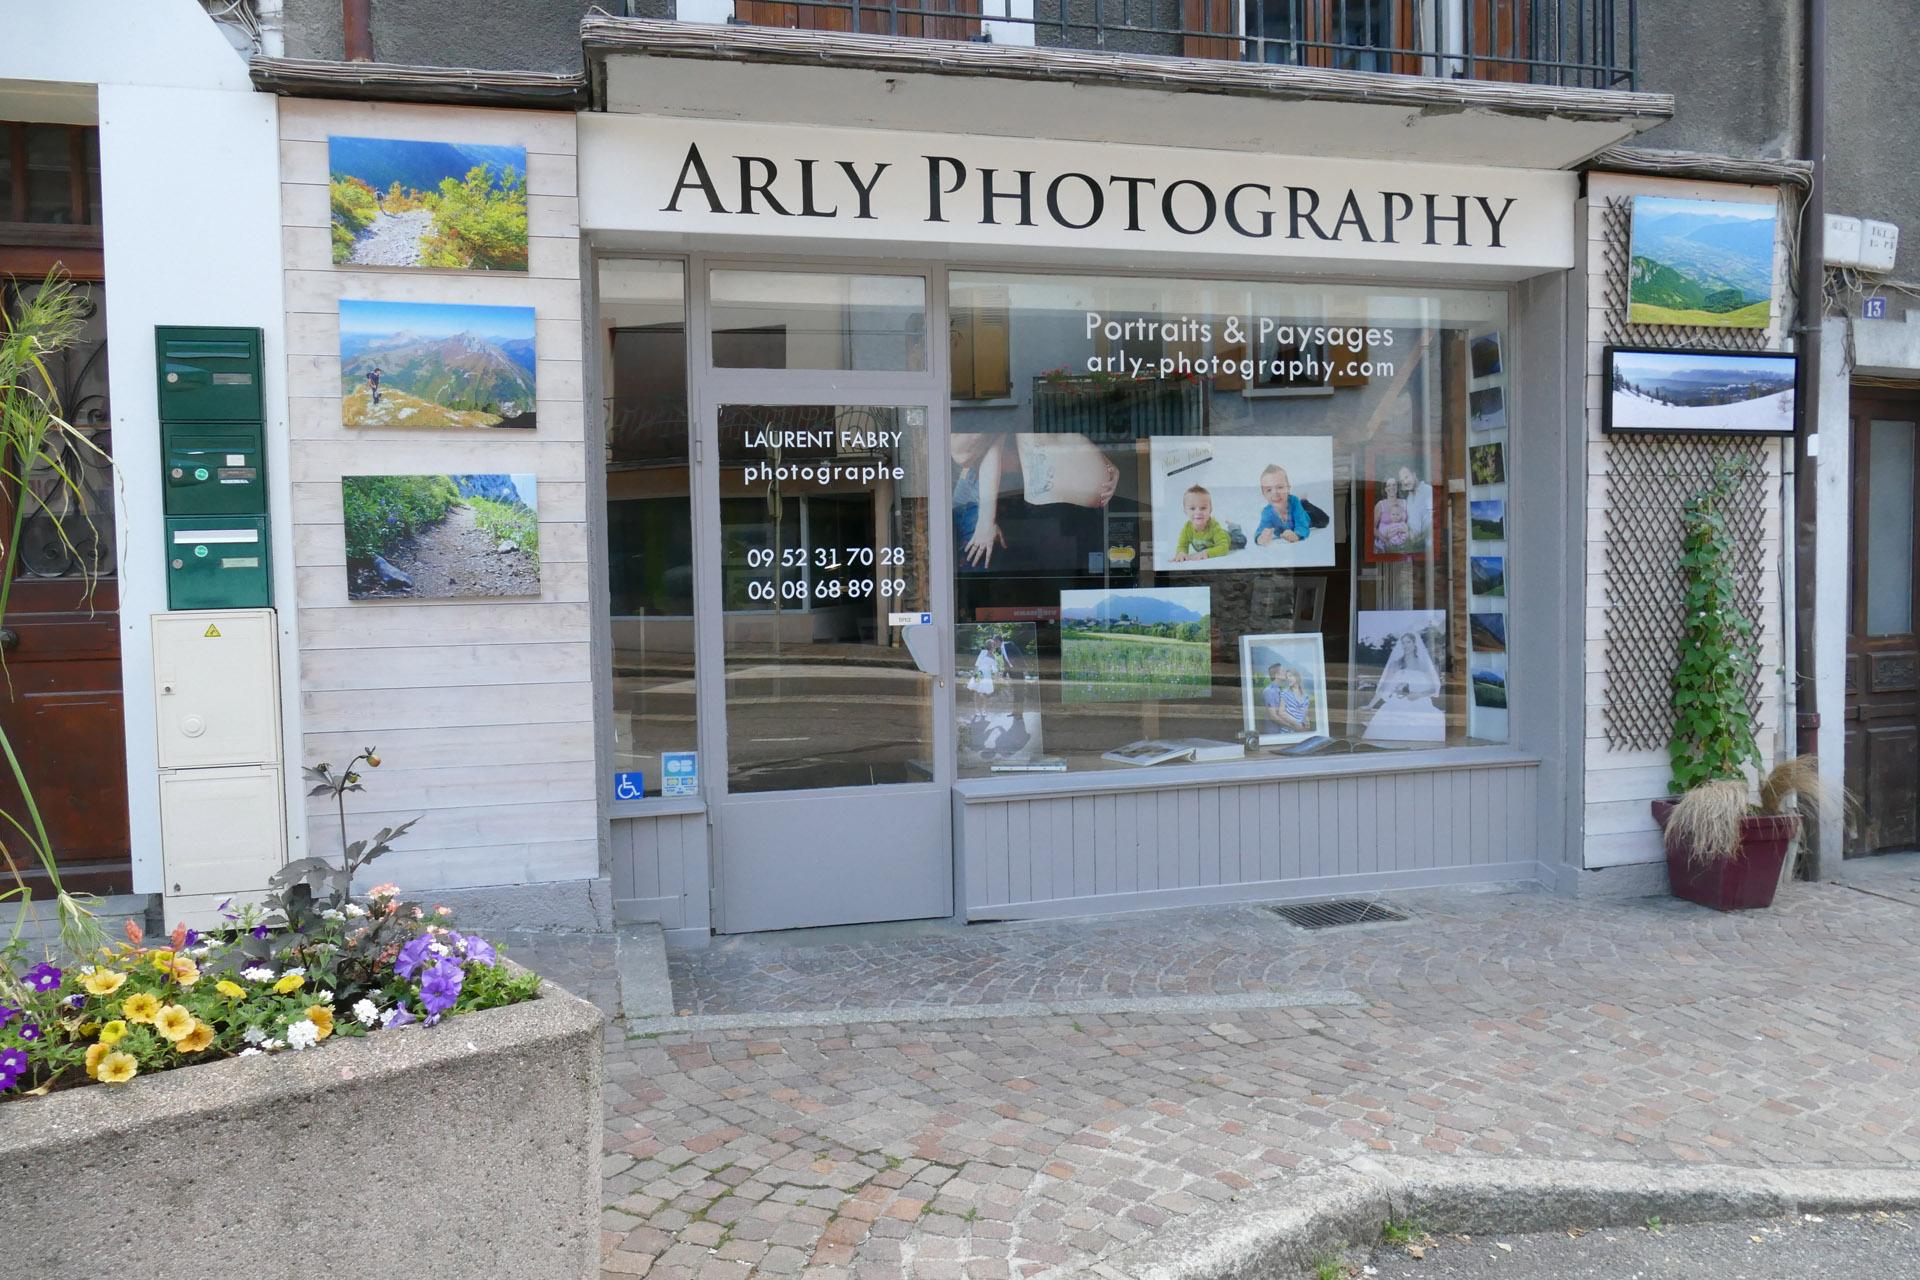 Studio ARLY PHOTOGRAPHY